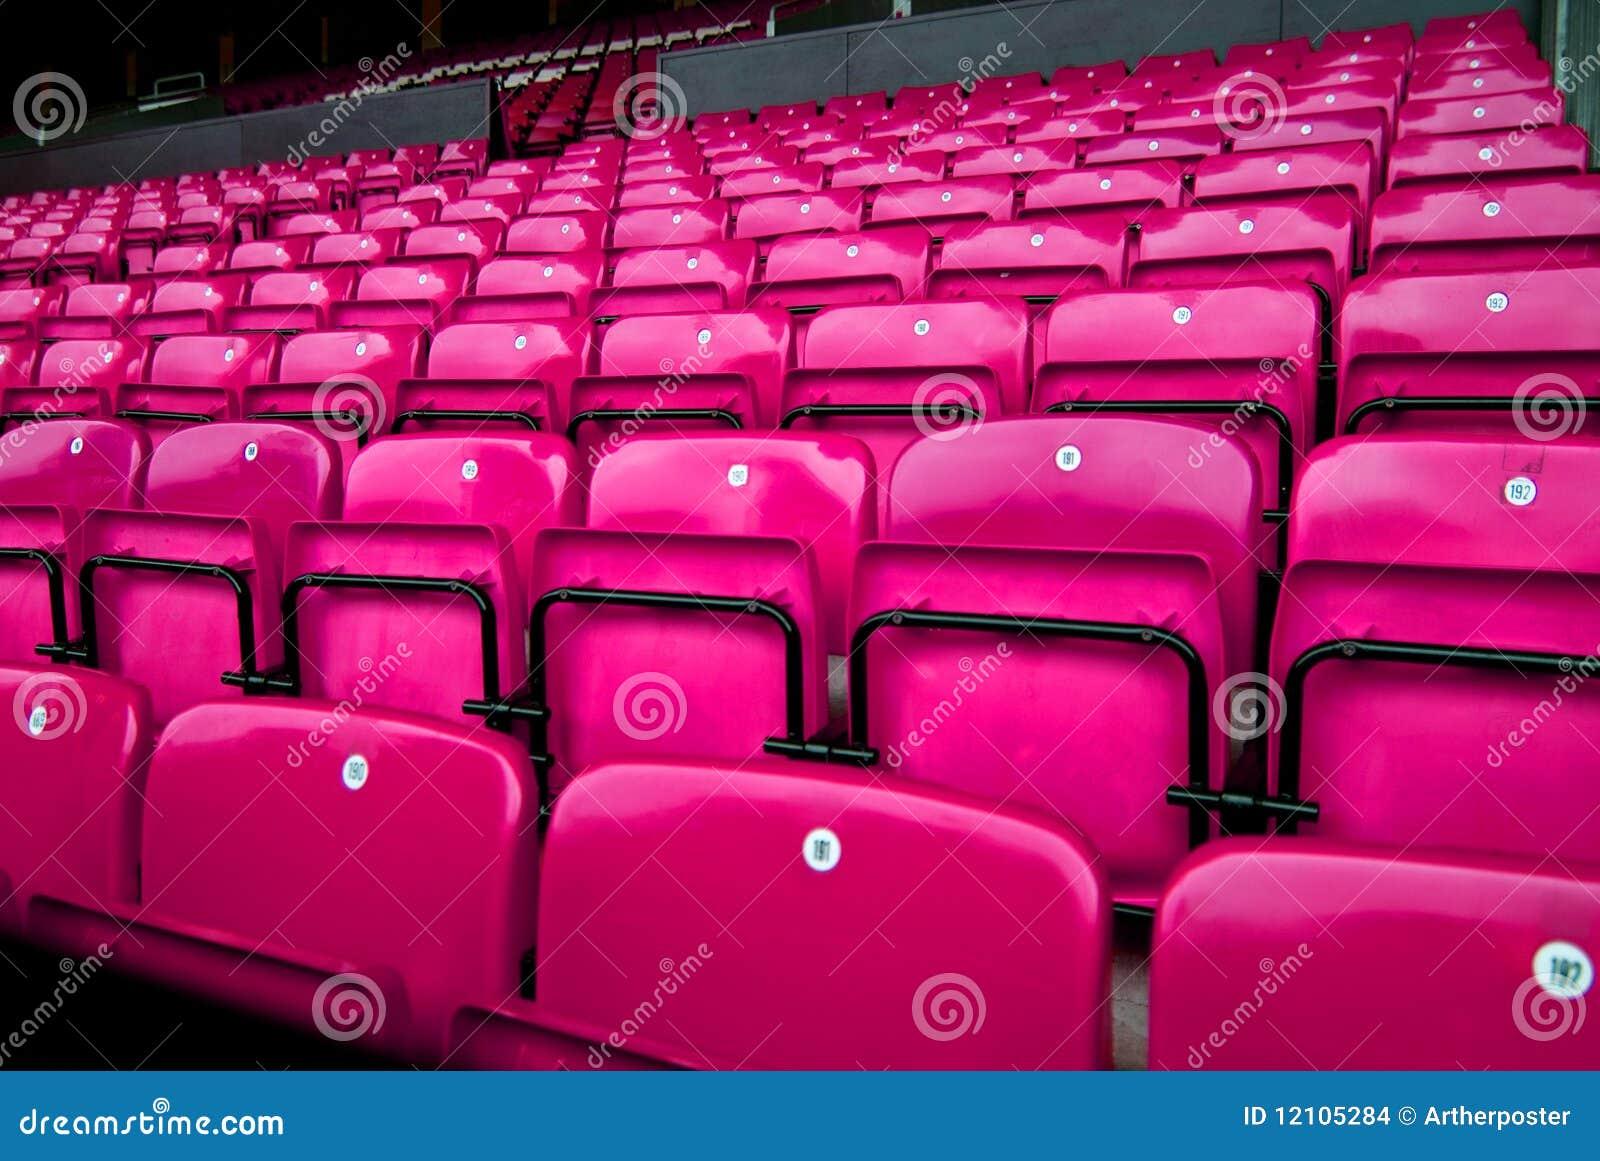 åhörare chairs pink